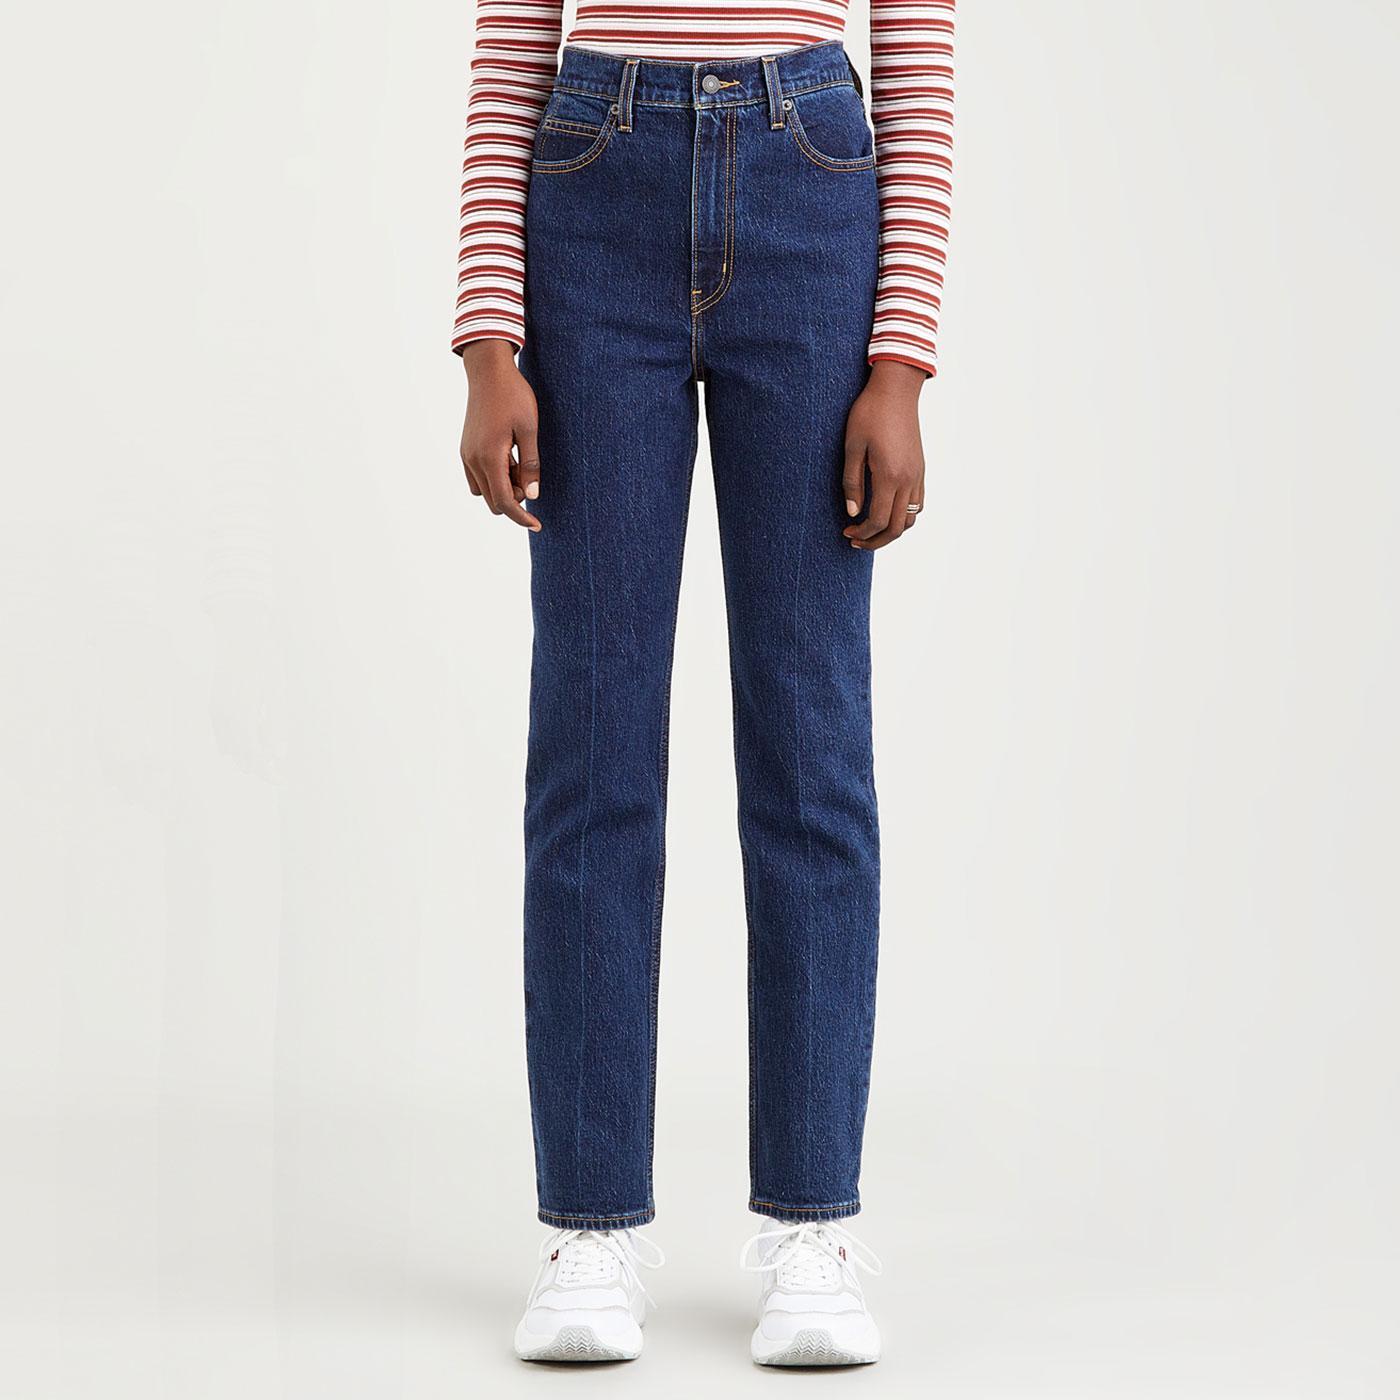 LEVI'S 70s High Slim Straight Jeans (Sonoma Stone)